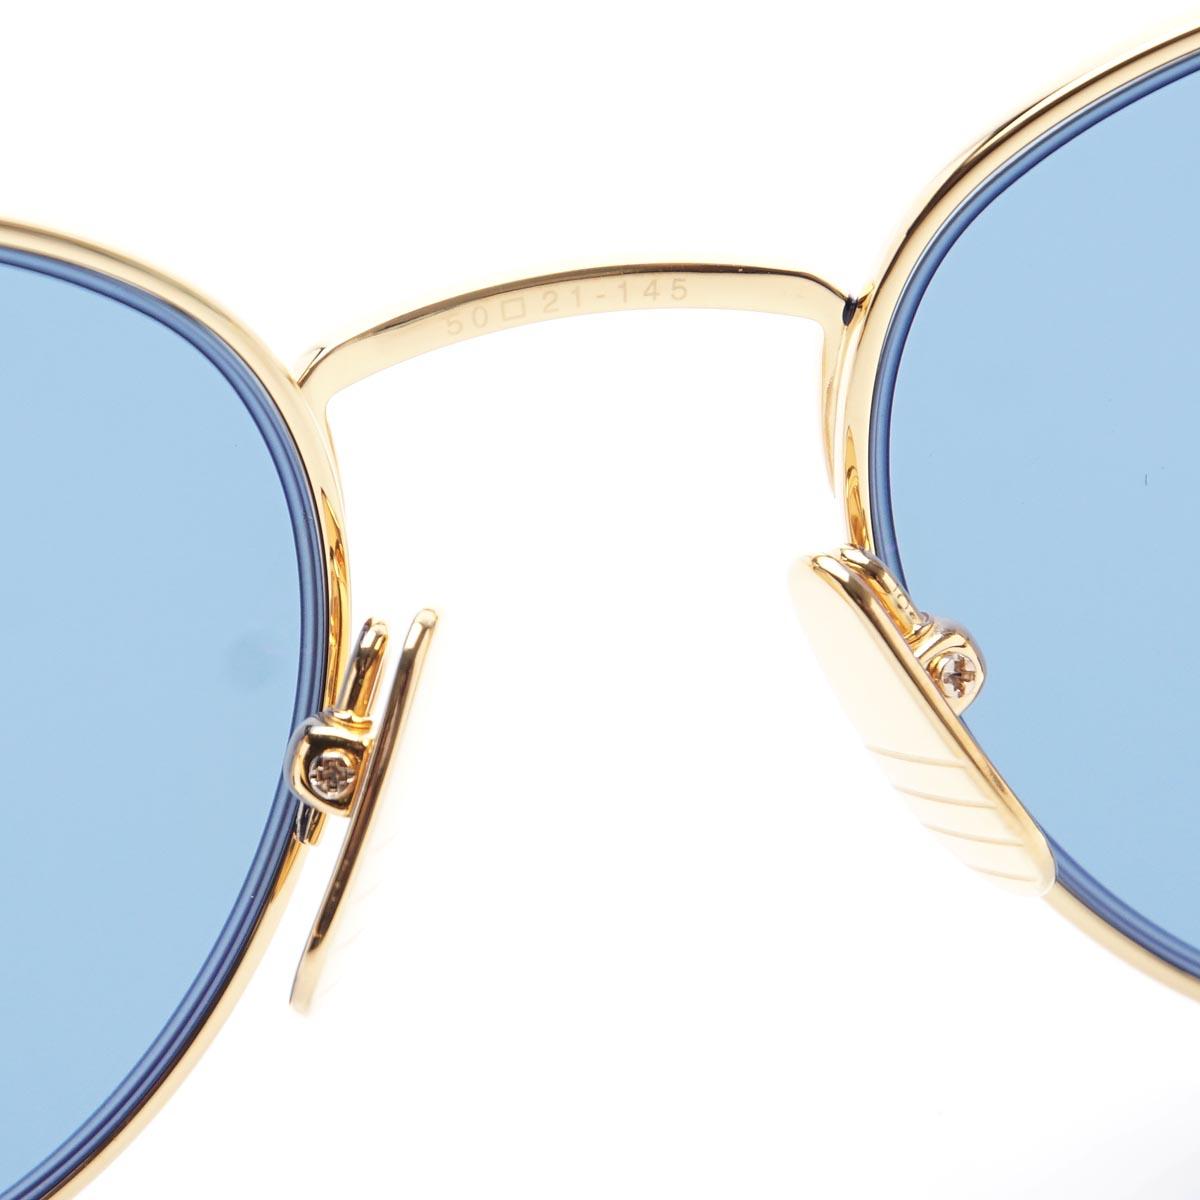 224b0abc59 Tom Browne THOM BROWNE. Sunglasses blue men design fashion resort celebrity  beach vacation gift present tb 106 c nvy gld 50 Oval